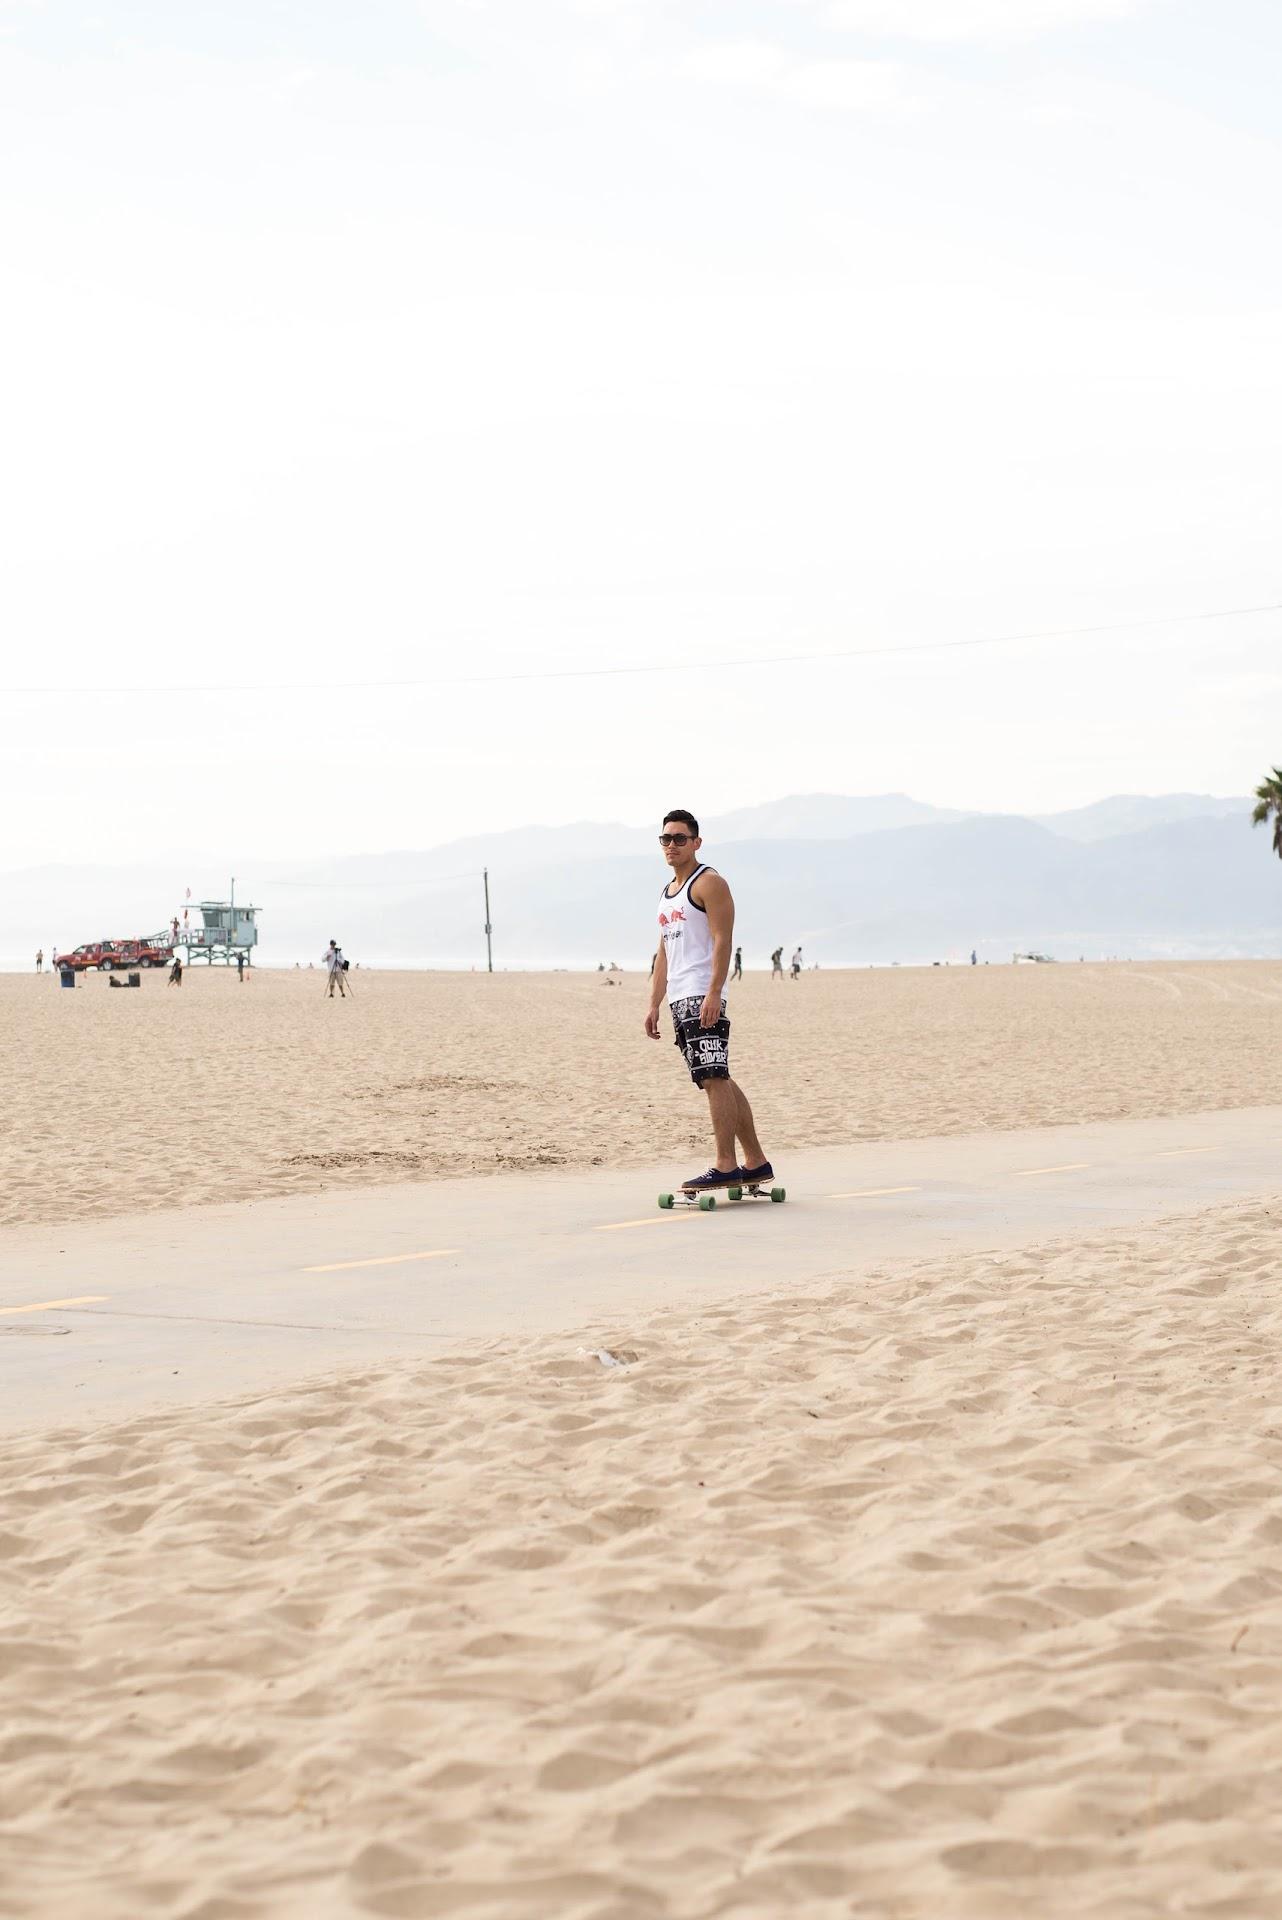 venice beach, socal, southern california, blogger, travel, best beaches, lds mormon